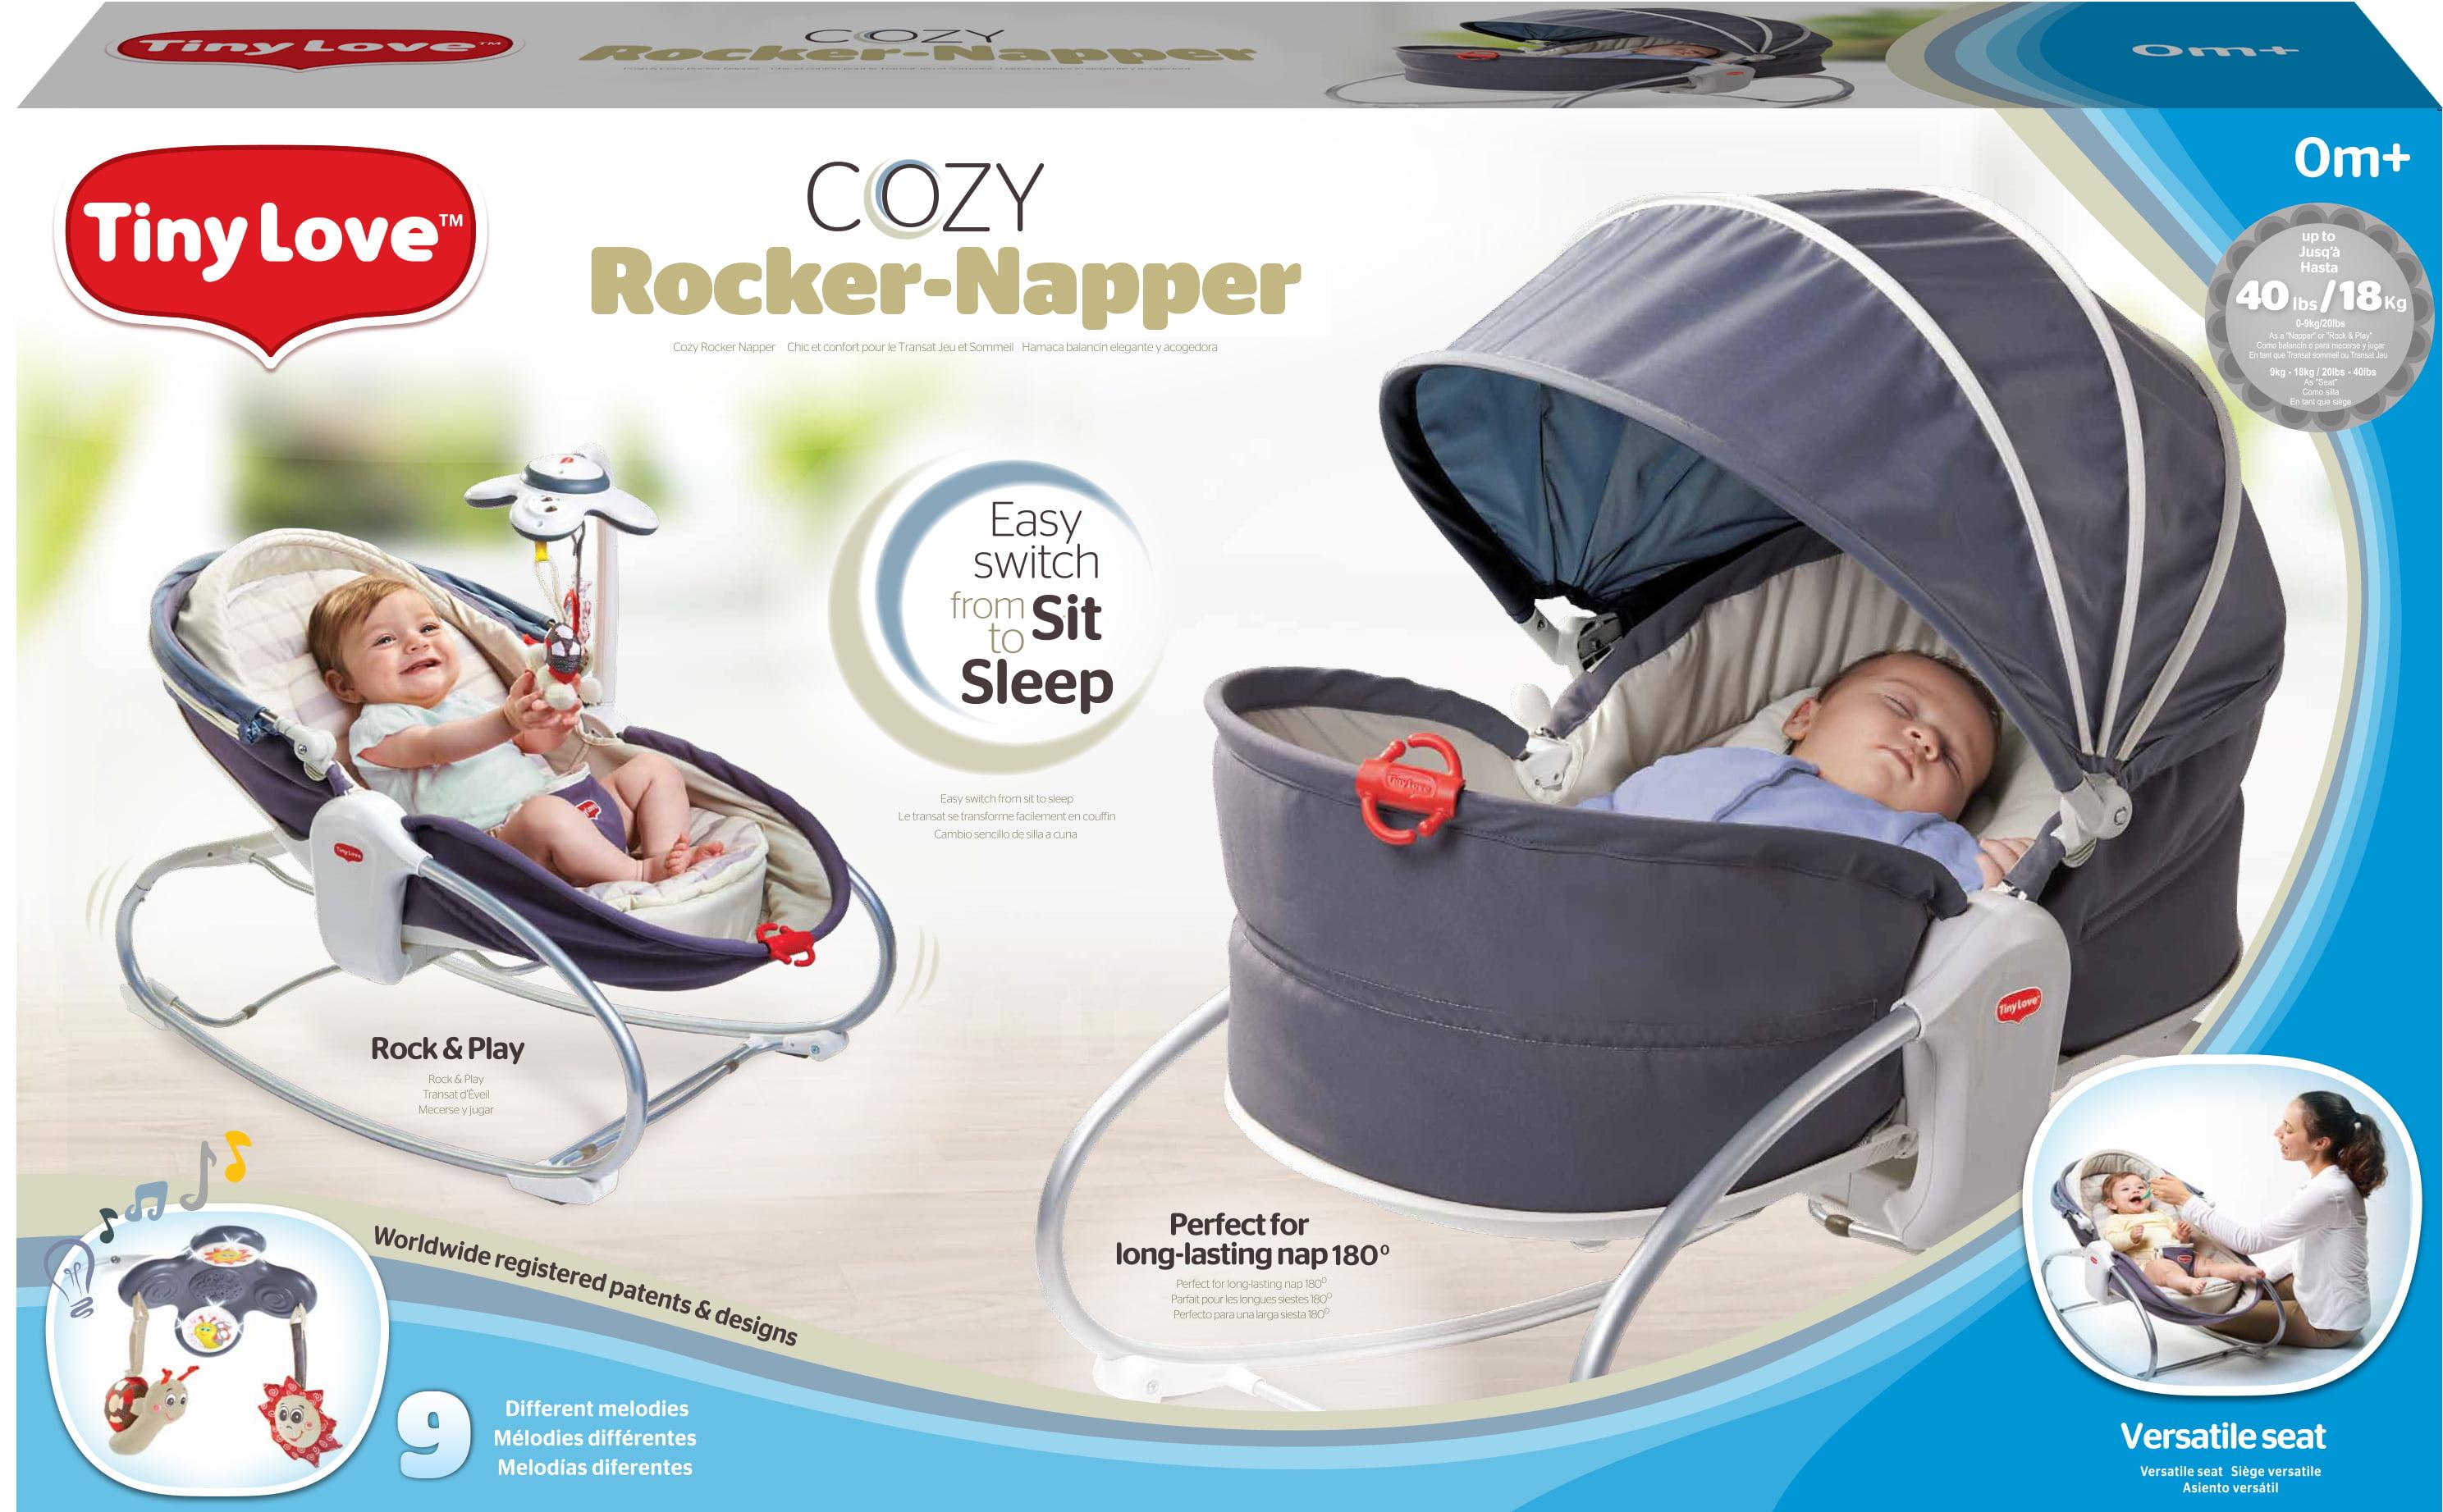 9e8eccf2f Tiny Love 3-in-1 Cozy Baby Rocker-Napper with Recline - Grey ...